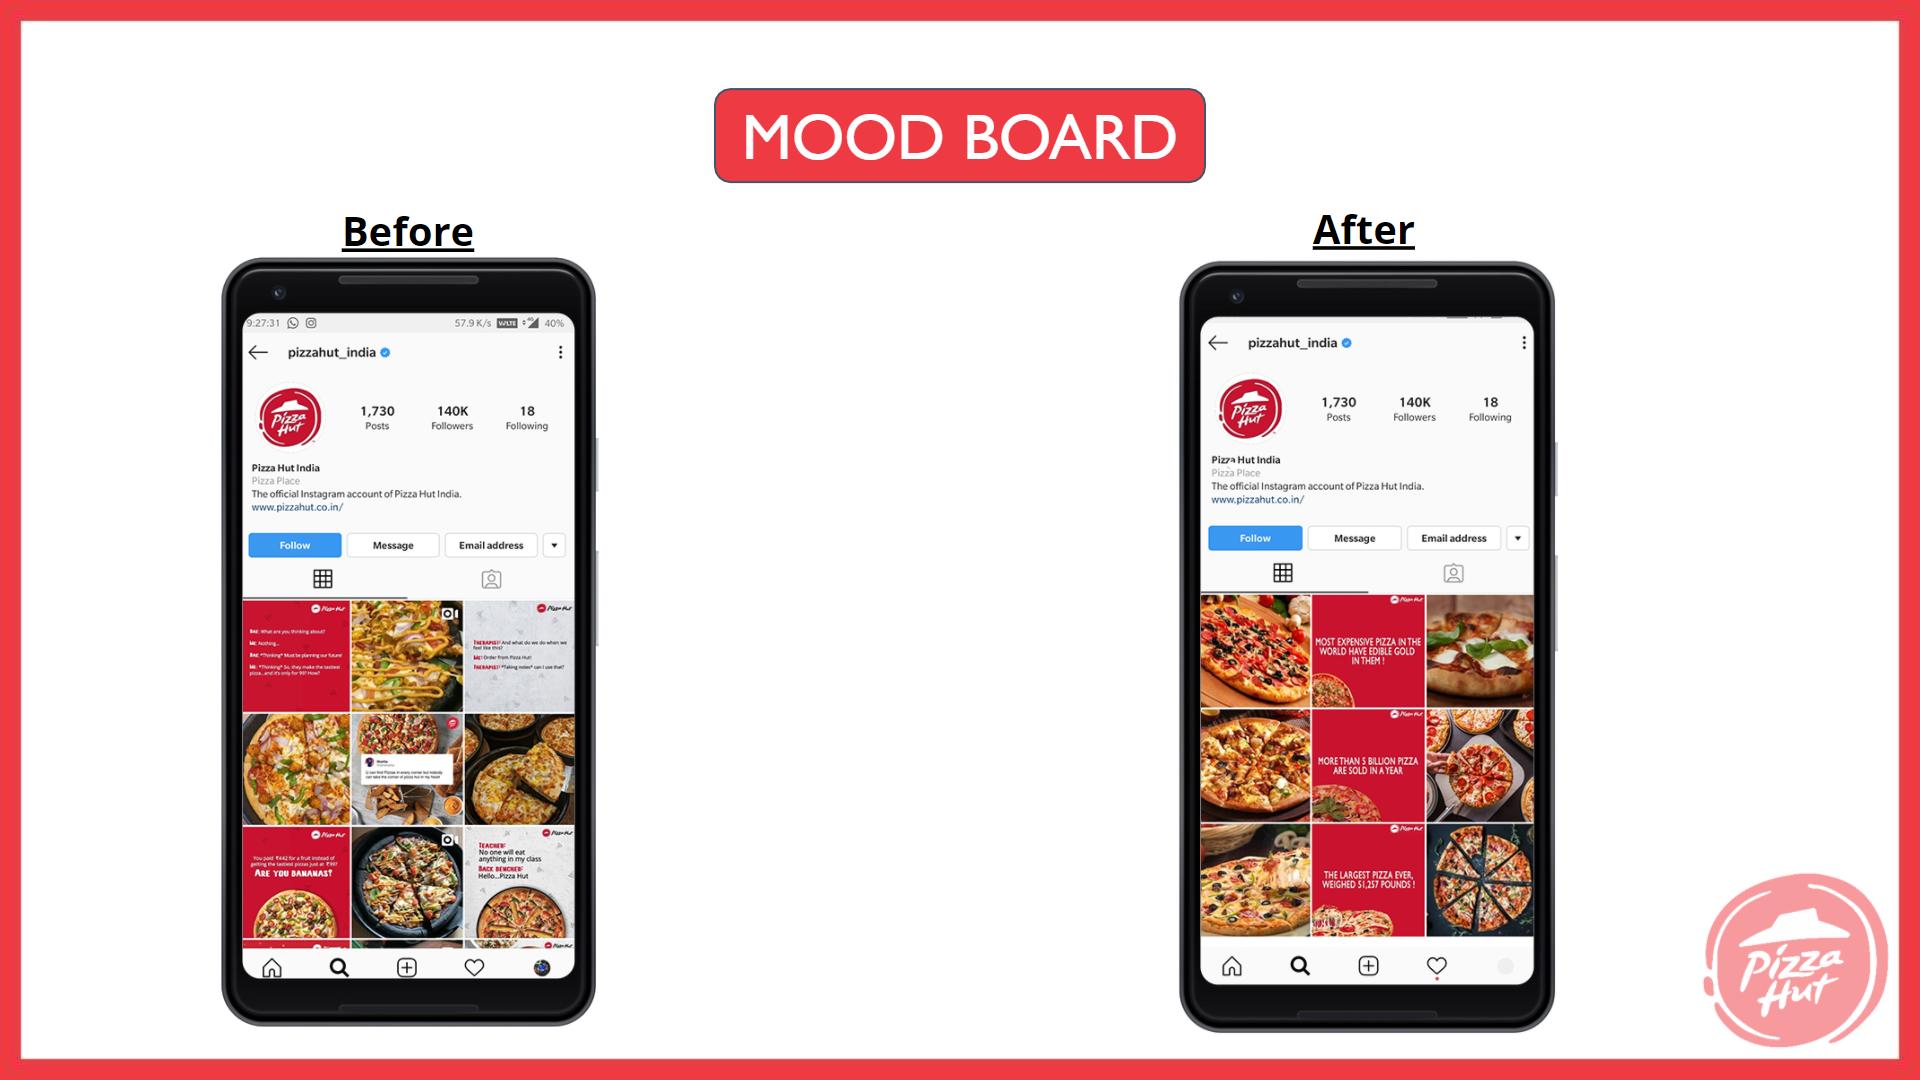 pizza hut marketing strategy Mood board - Pizza Hut Marketing and Advertising Strategy